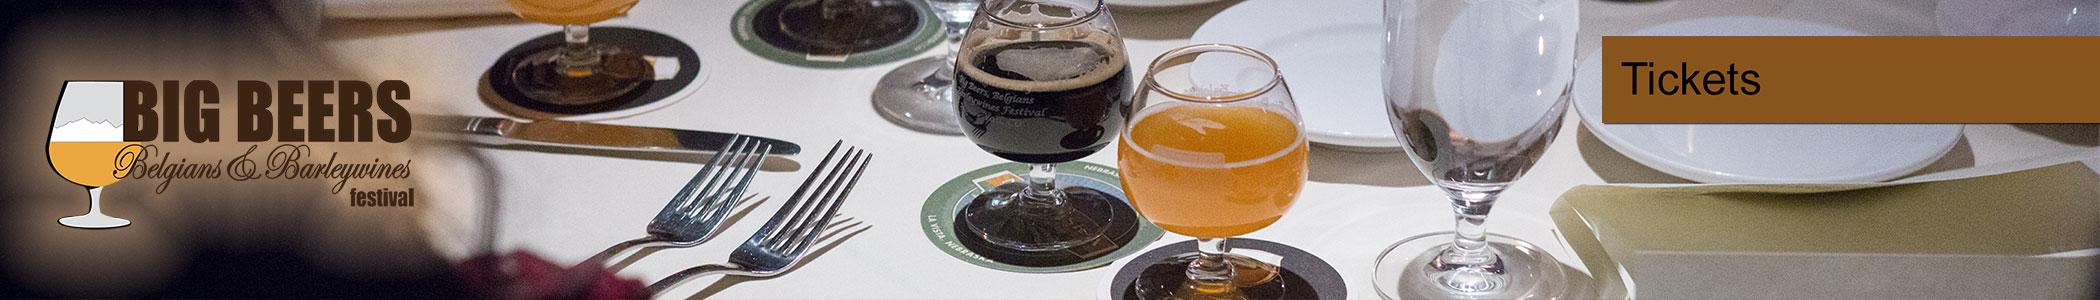 Big Beers, Belgians & Barleywines Beer Festival Tickets